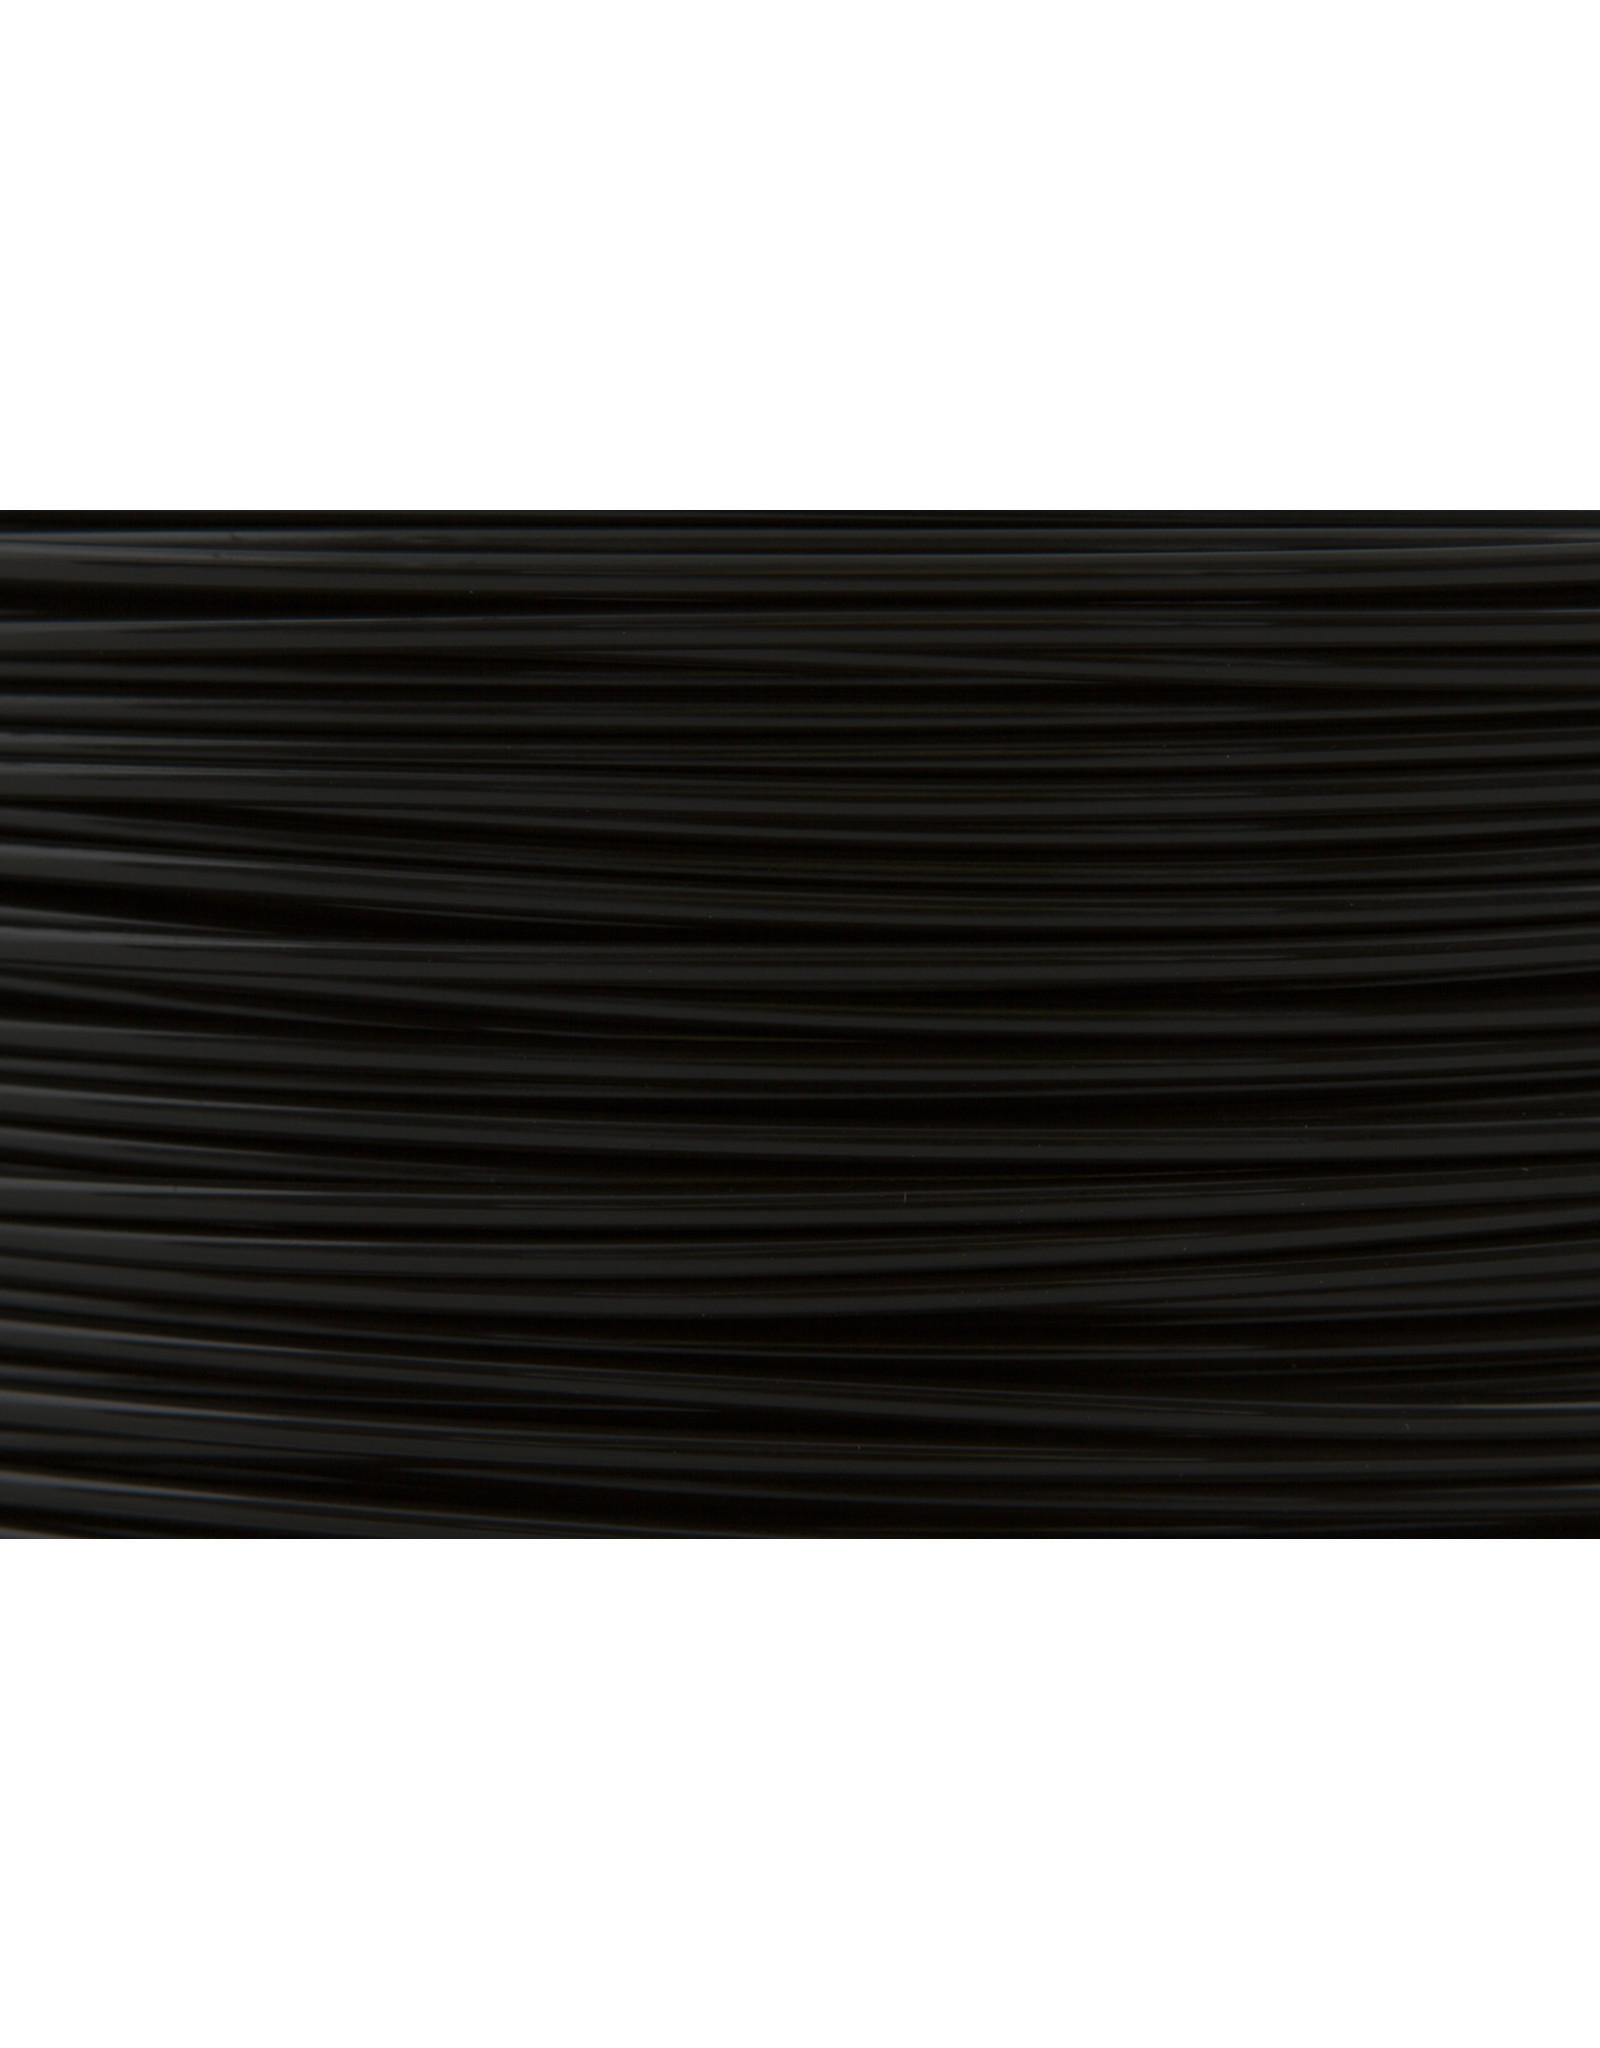 Prima PrimaSelect PLA 1.75mm - 750gr Black